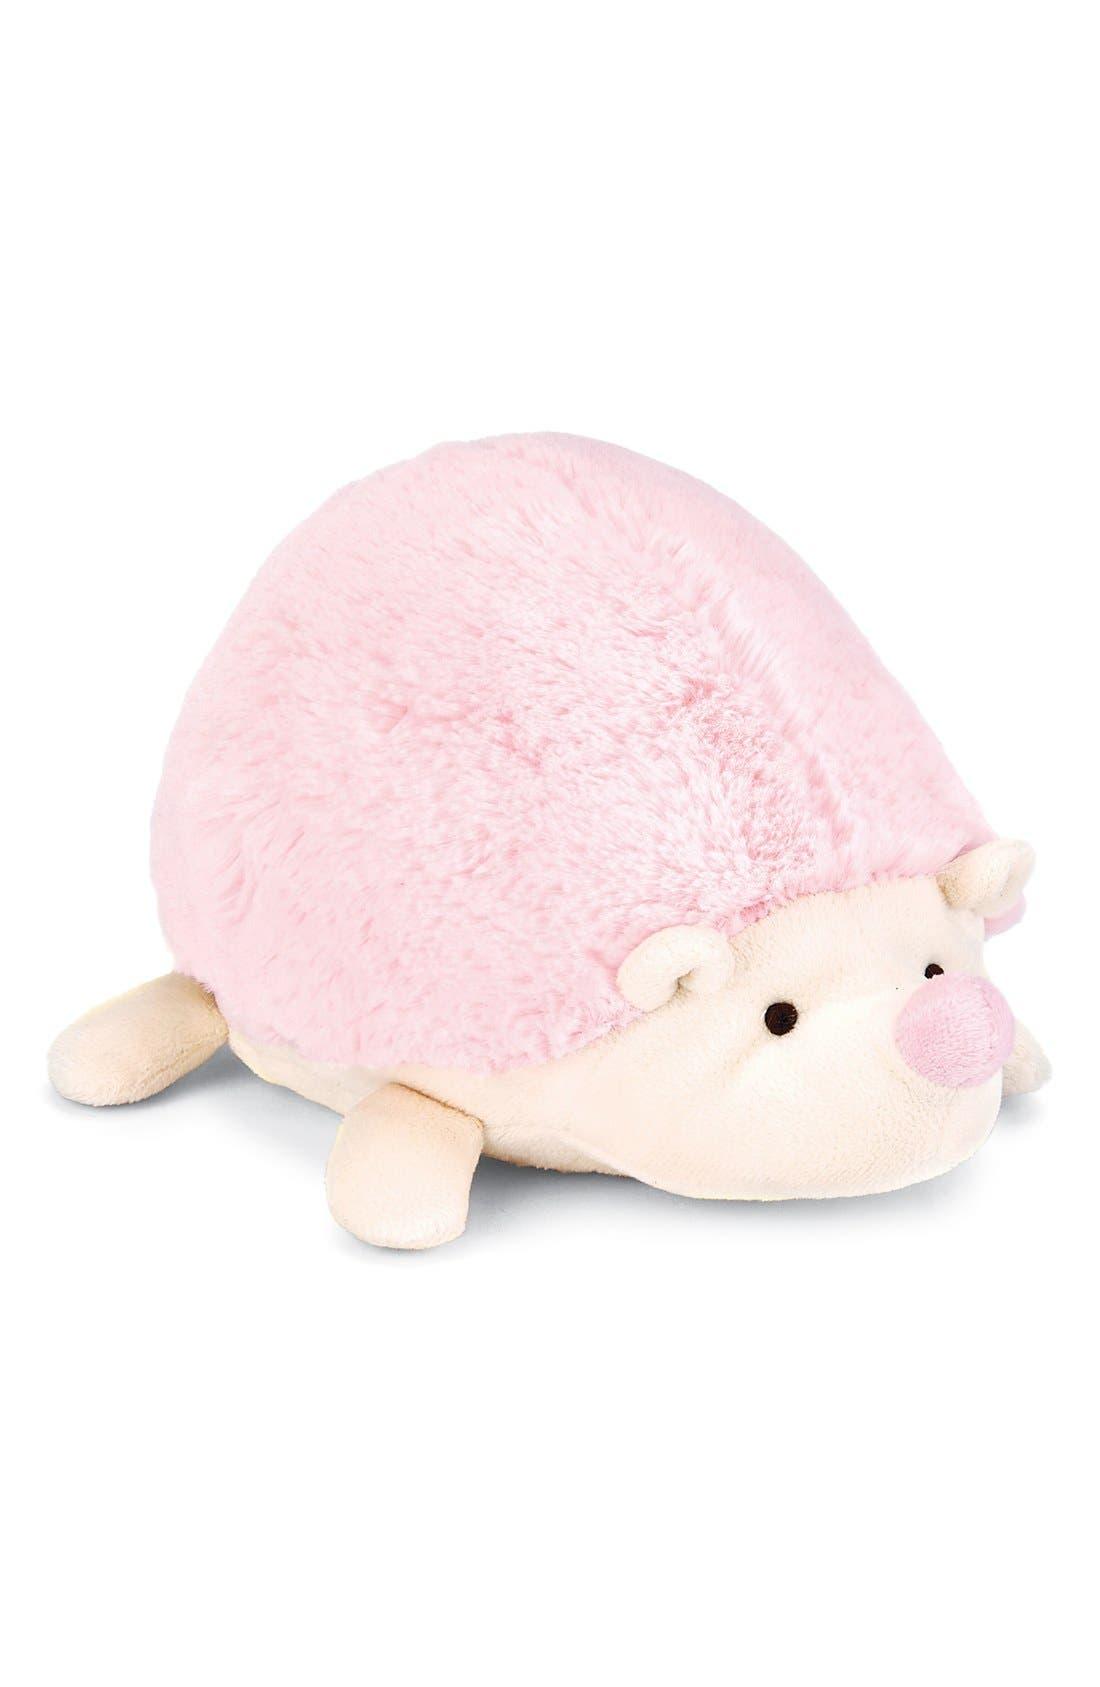 Jellycat Happy Pink Hedgehog Stuffed Animal Nordstrom